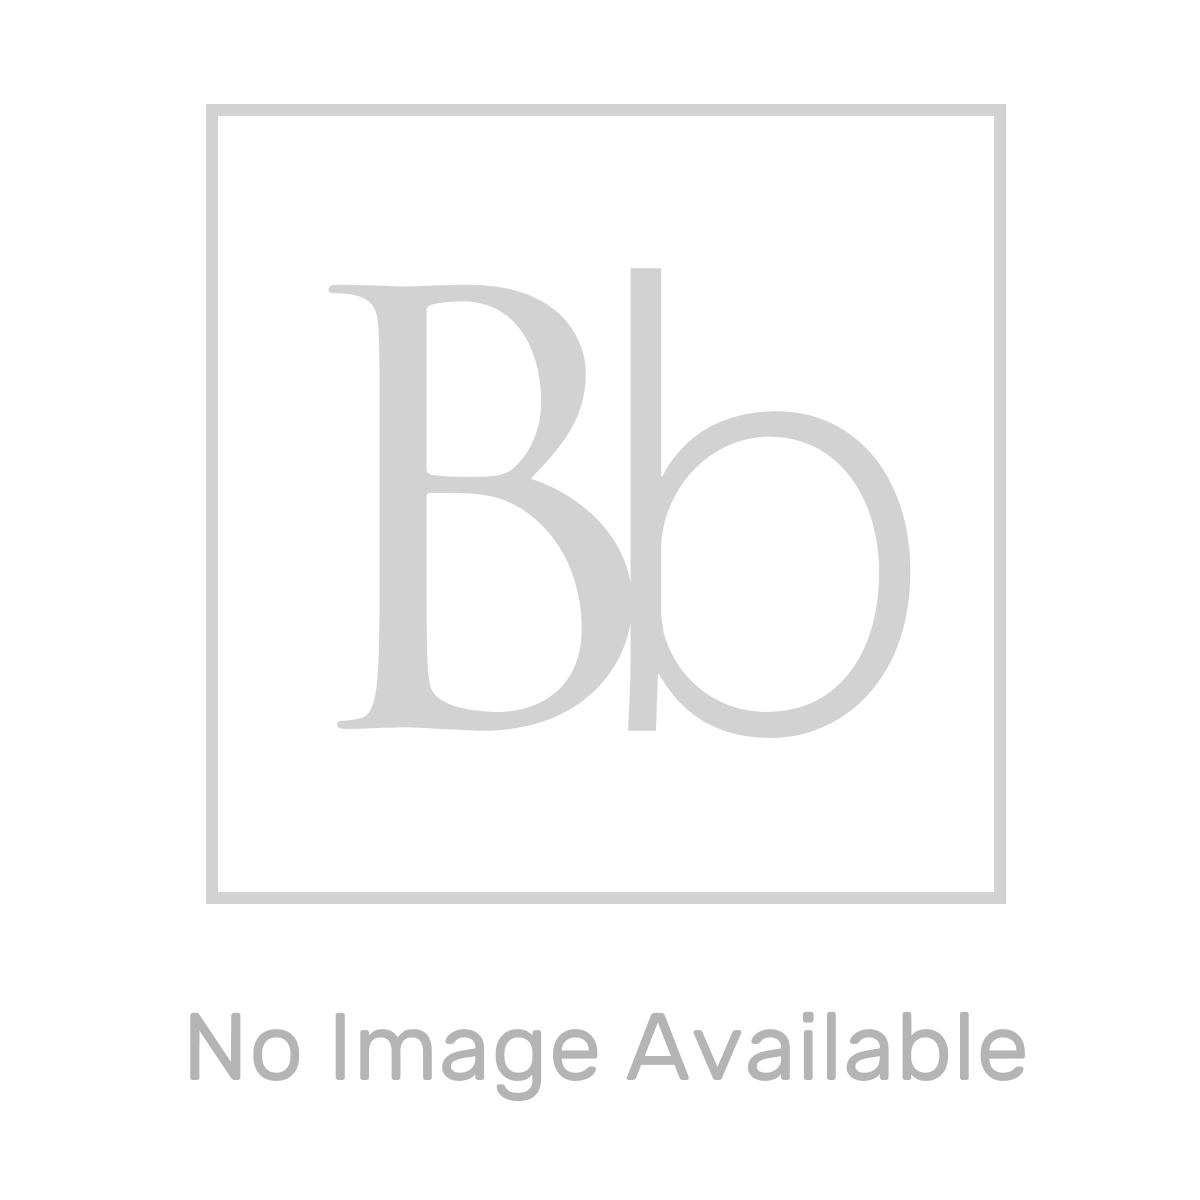 RAK Surface Charcoal Lappato Tile 600 x 600mm